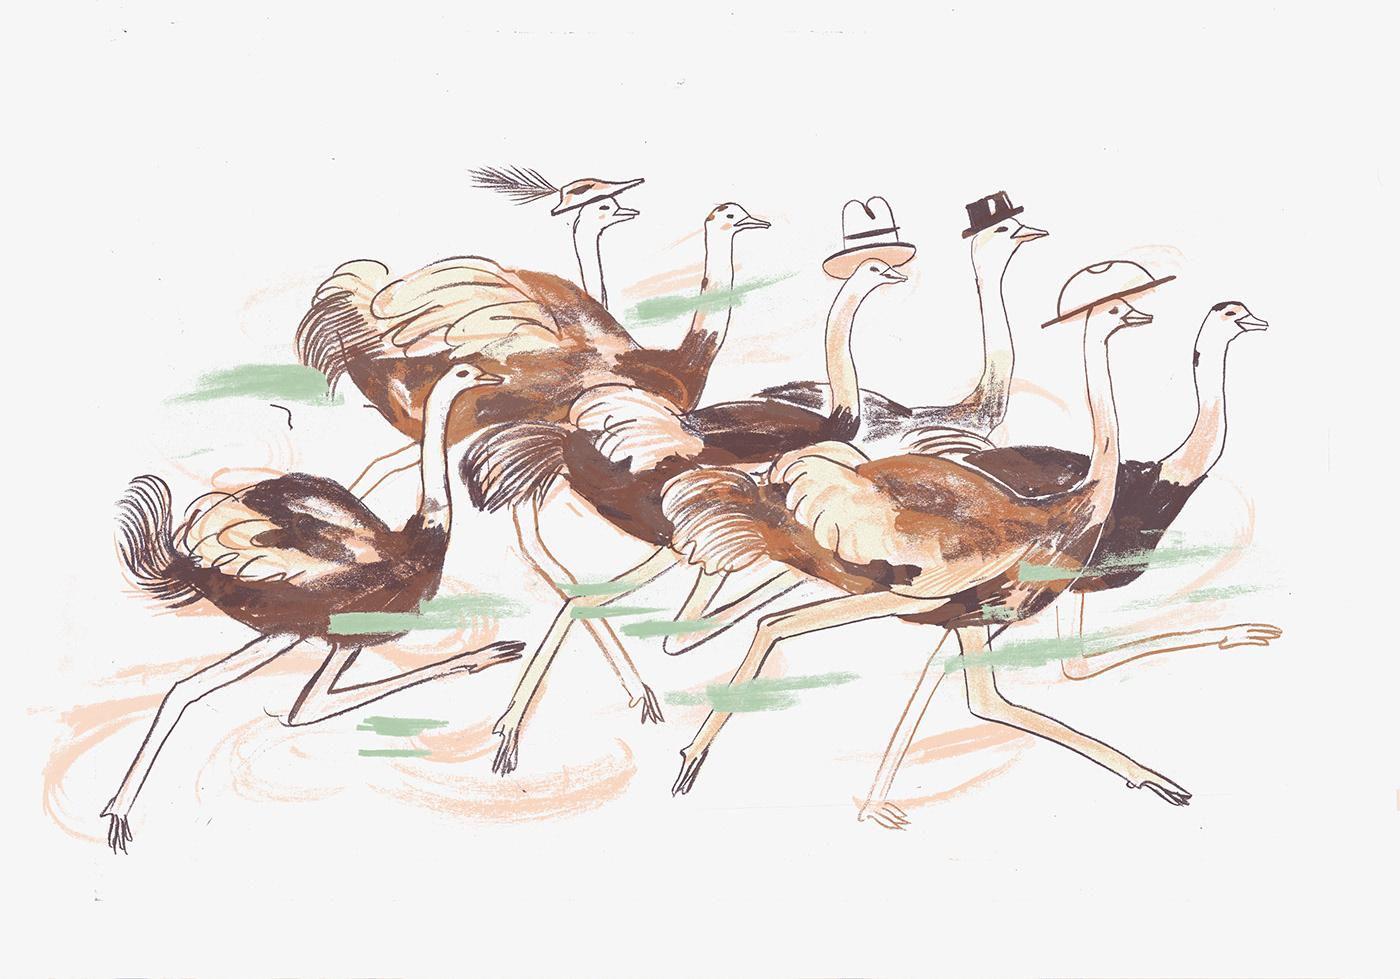 ostrich; ostriches; running; animals; fast food; hats; crazy hats; fun